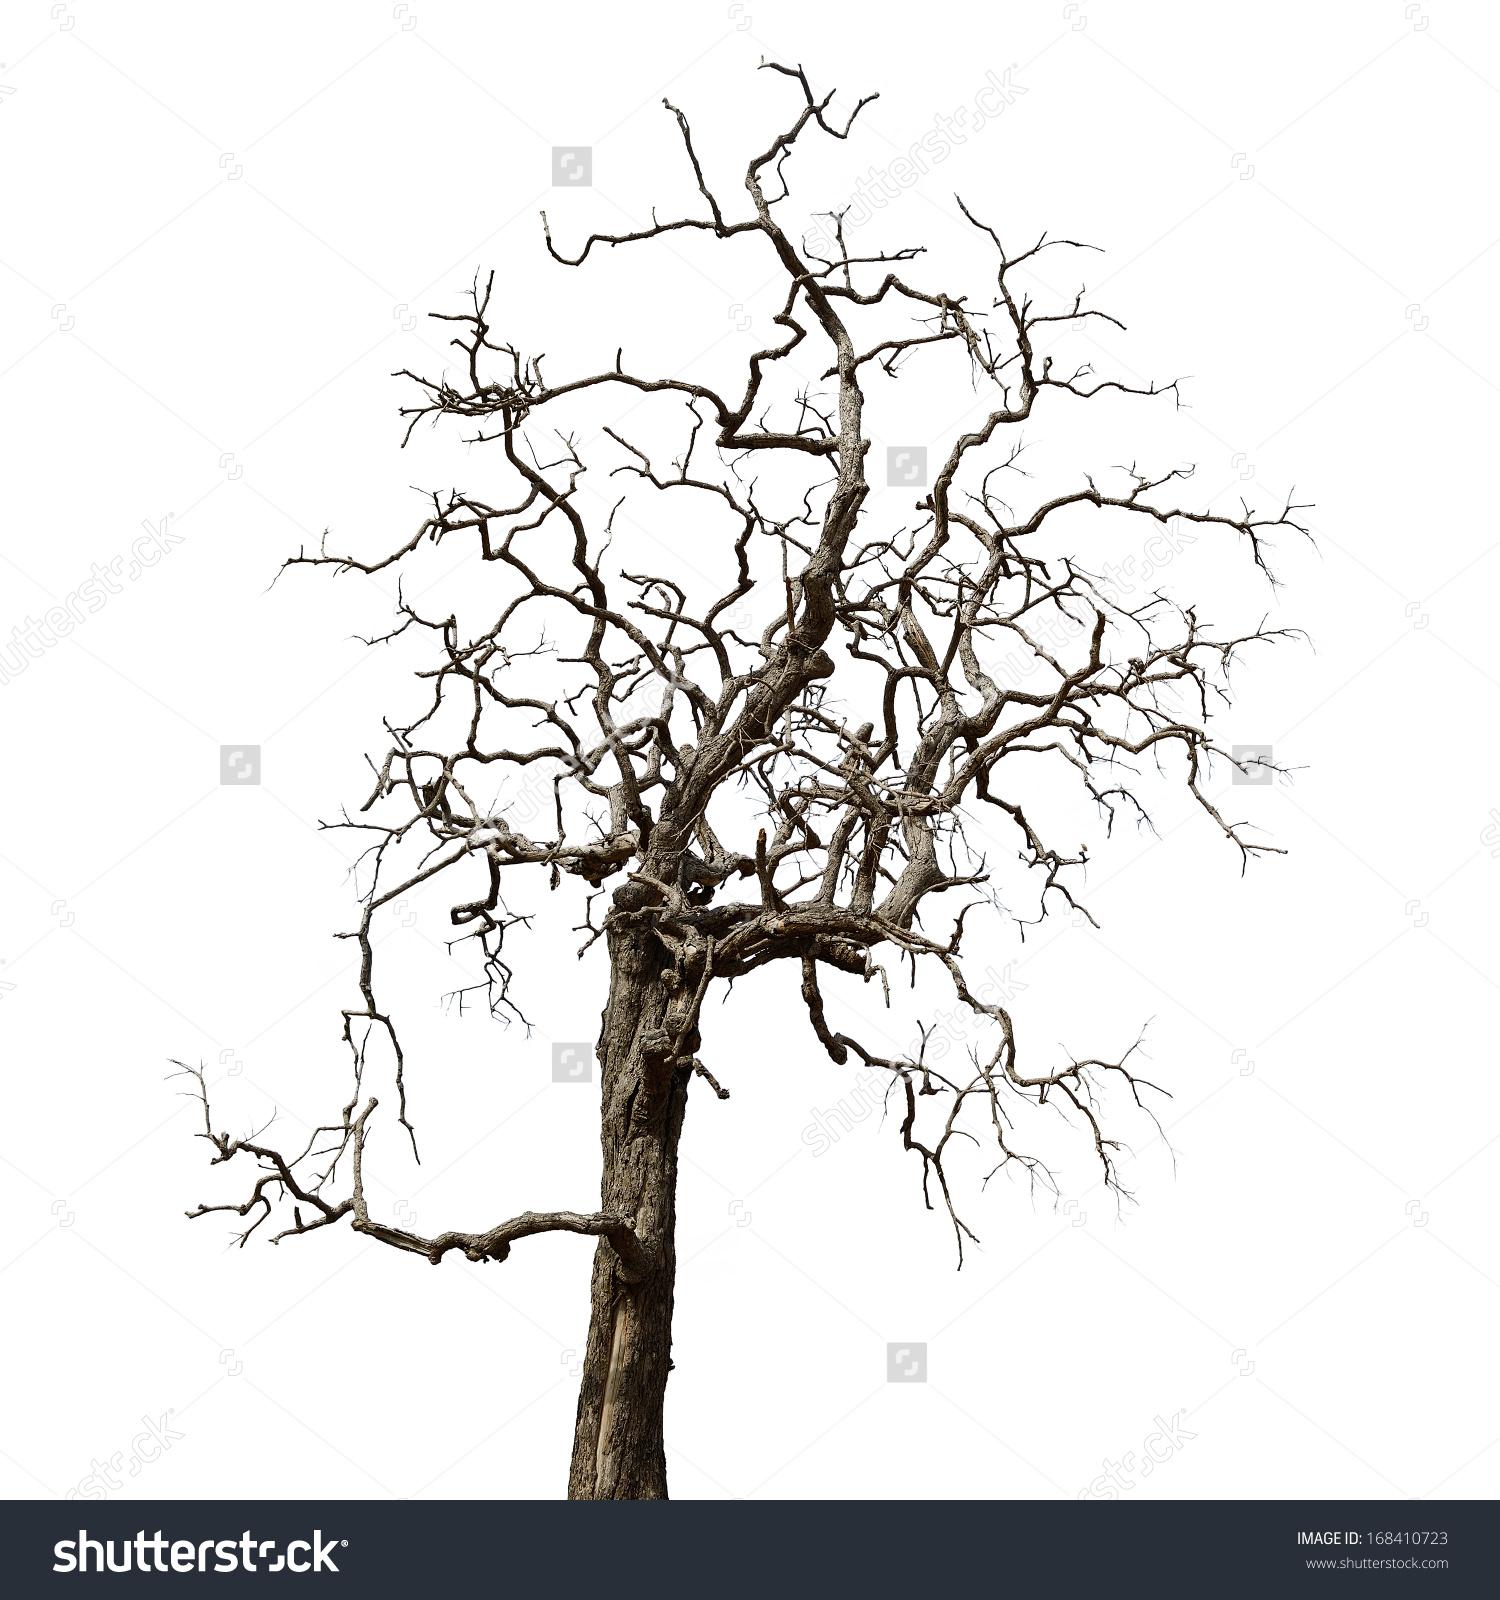 Dead sycamore tree clipart.